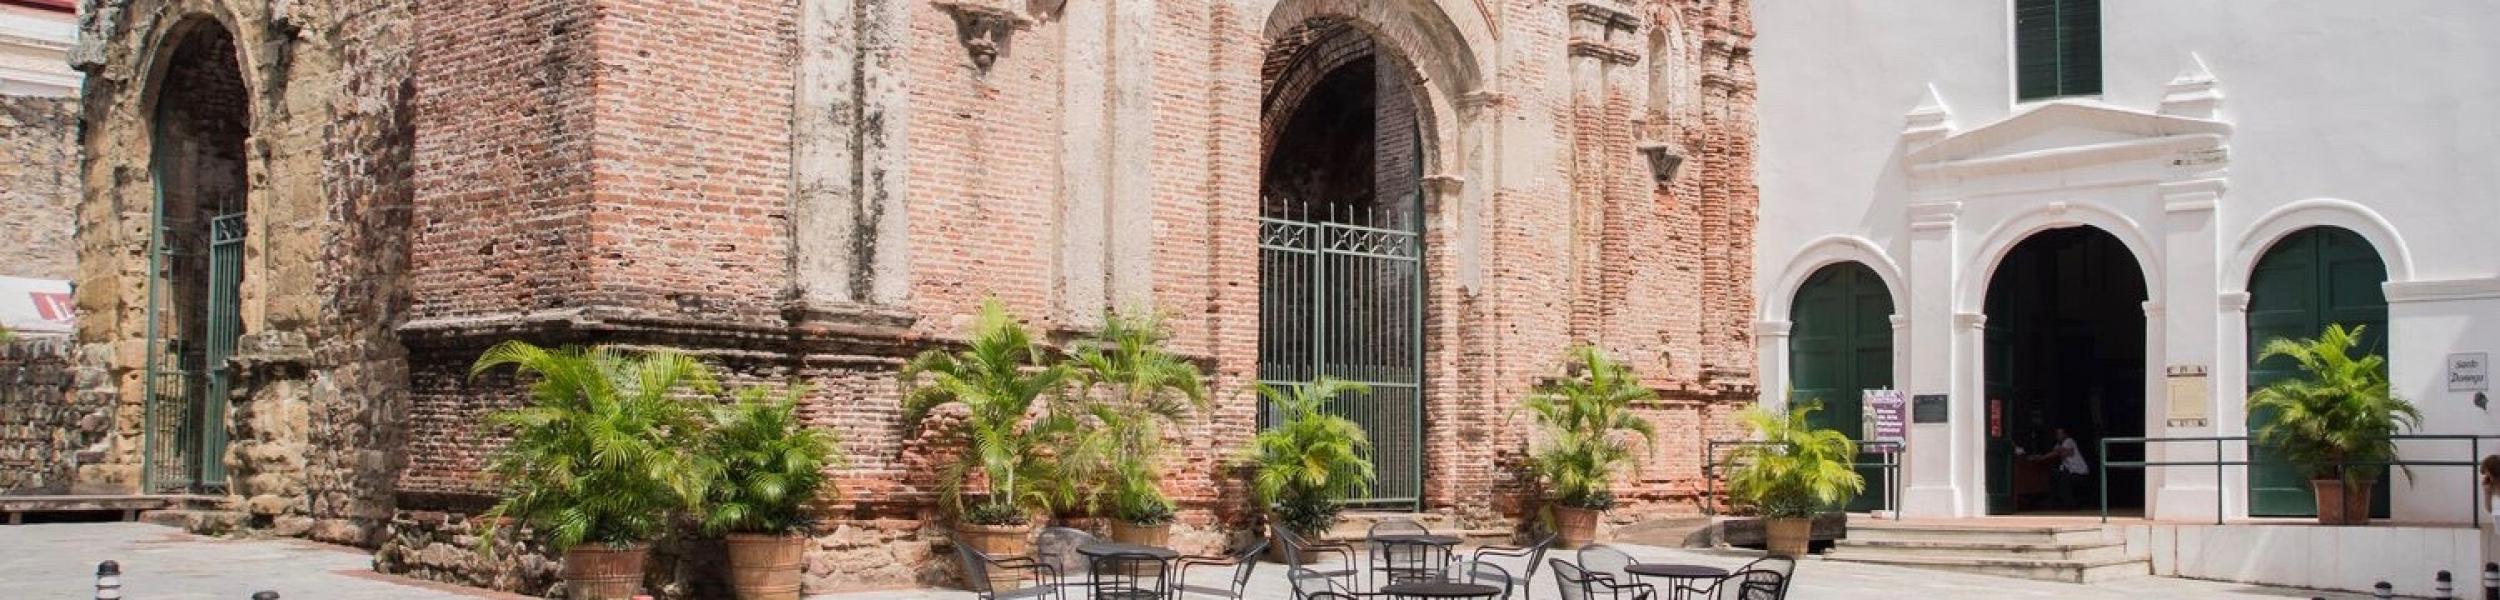 arco-chato-casco-viejo-panama-mostaza-restaurant